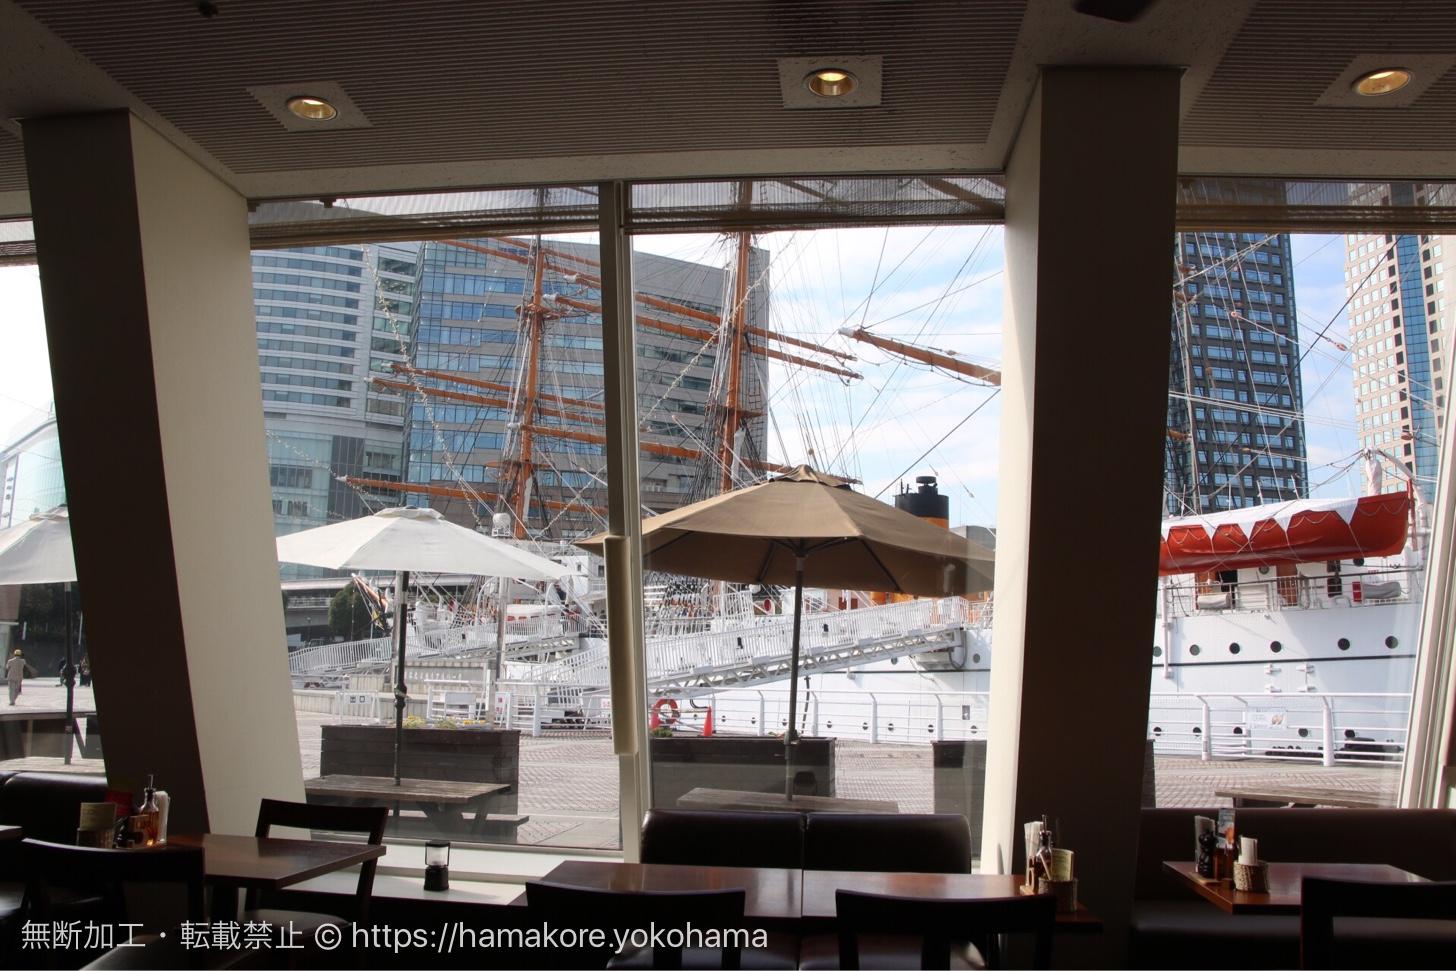 grill&sea table AKITO 店内の様子